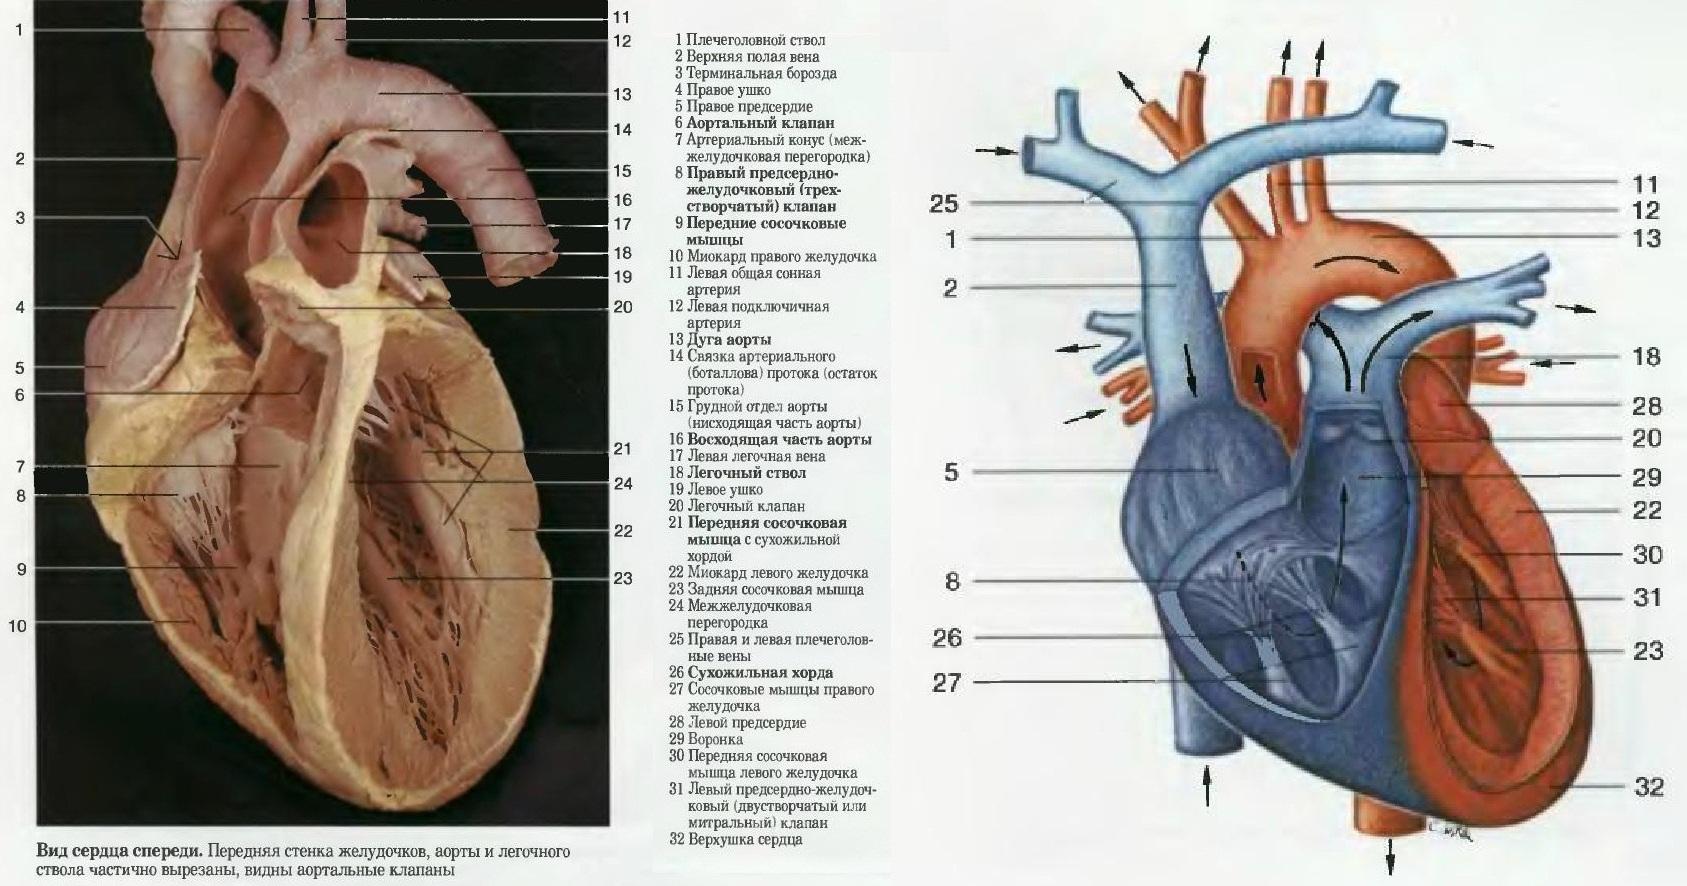 Internal heart anatomy